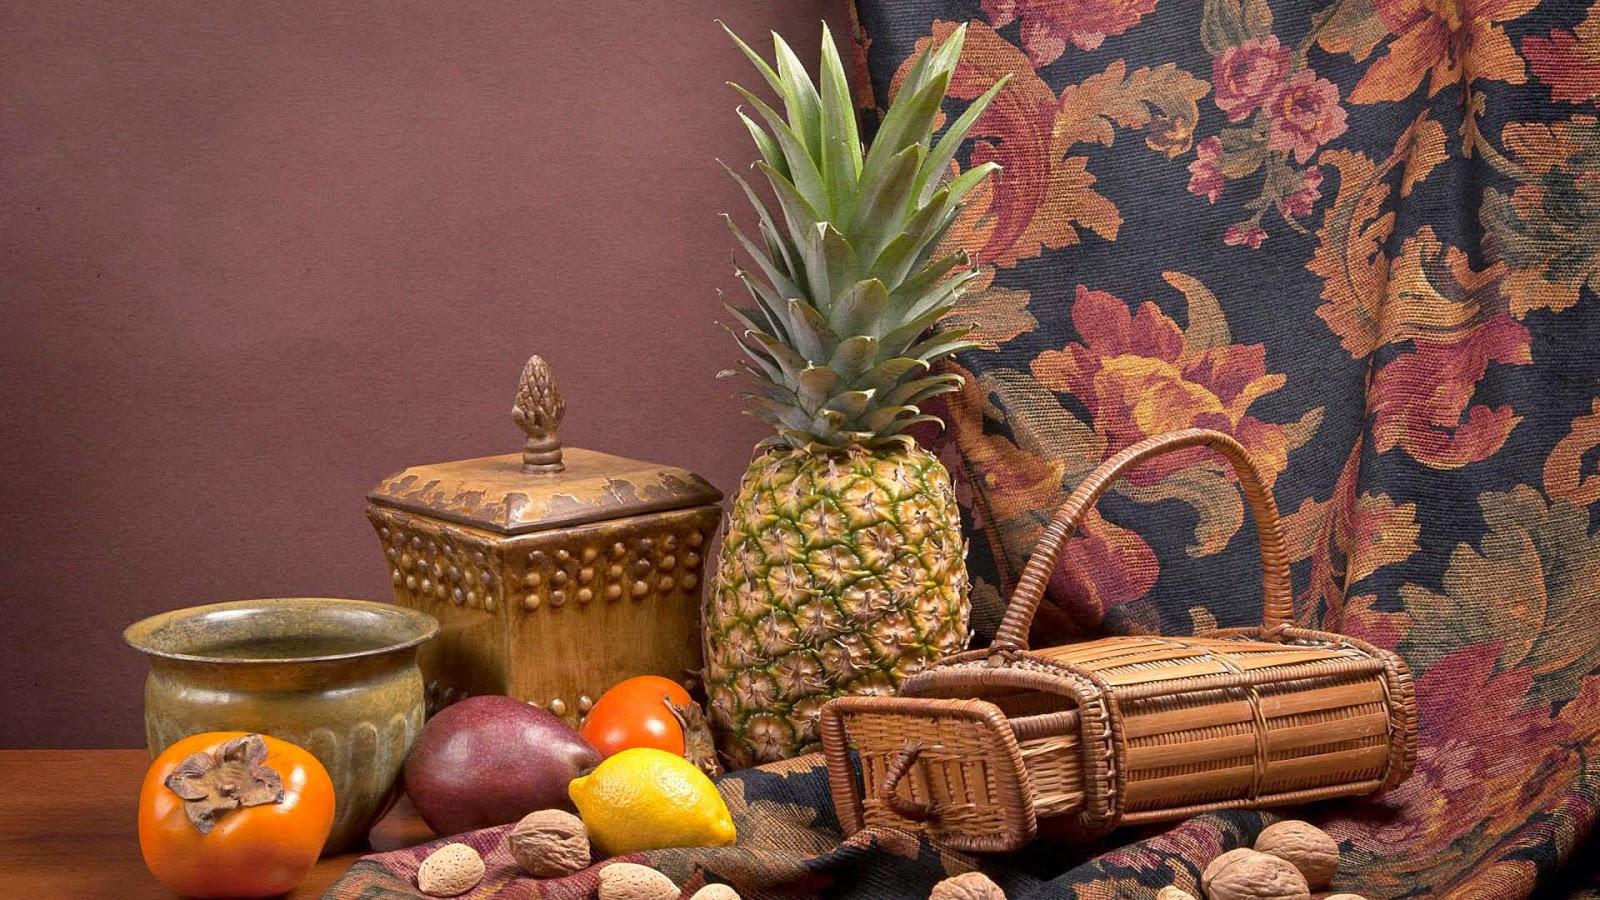 Mix Fruit wallpapers